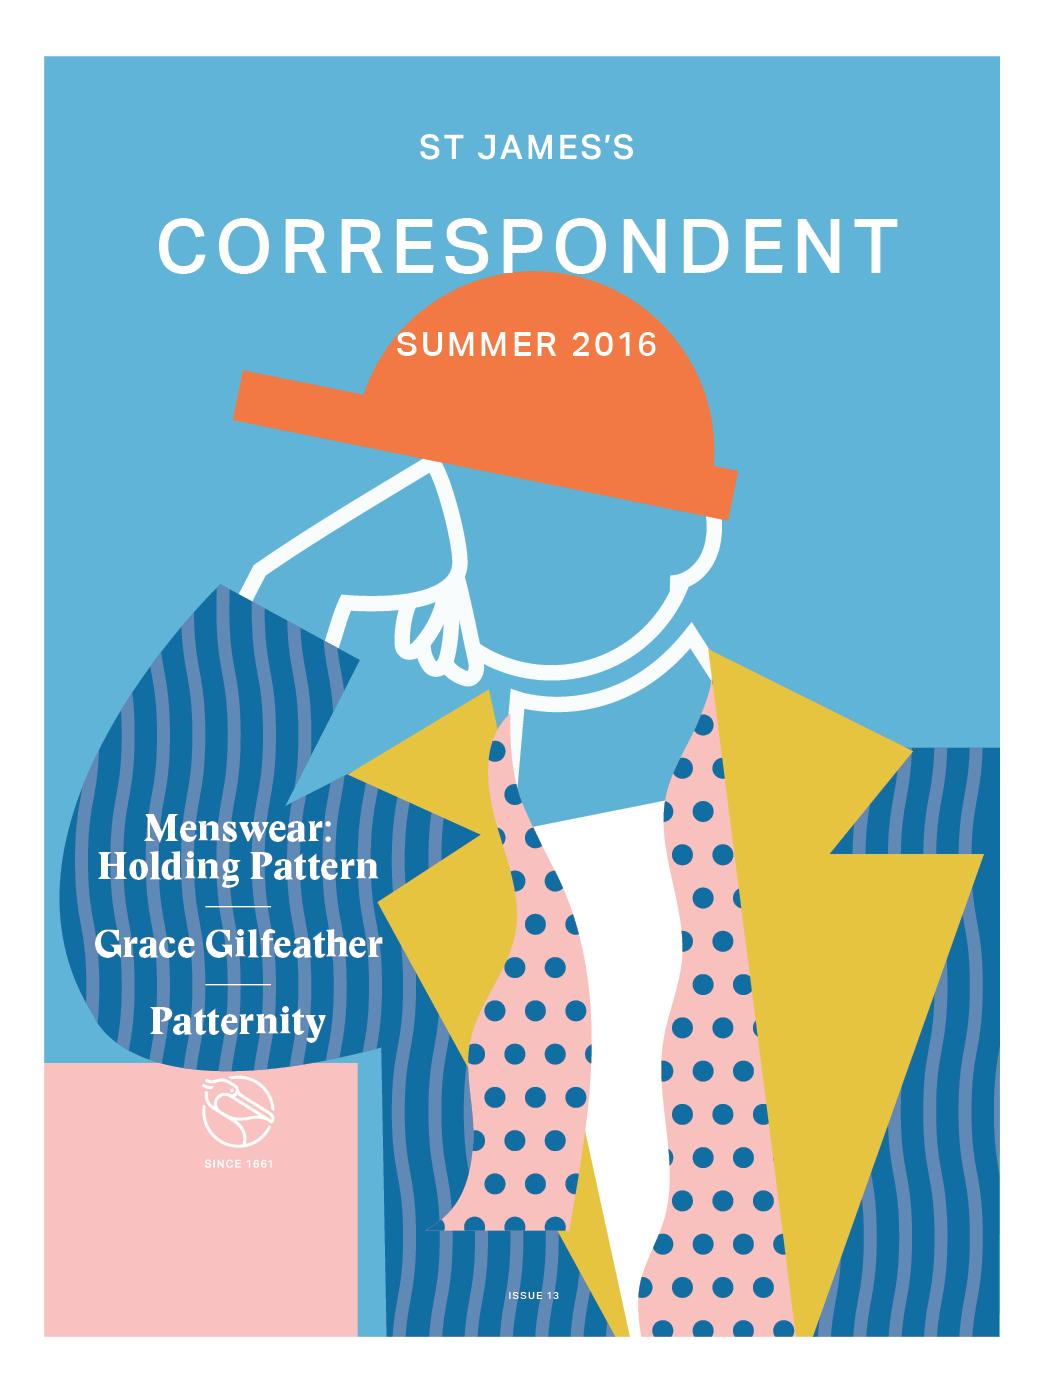 Lauren Rolwing | Exploring Menswear Prints & Patterns #illustration #digitalillustration #art